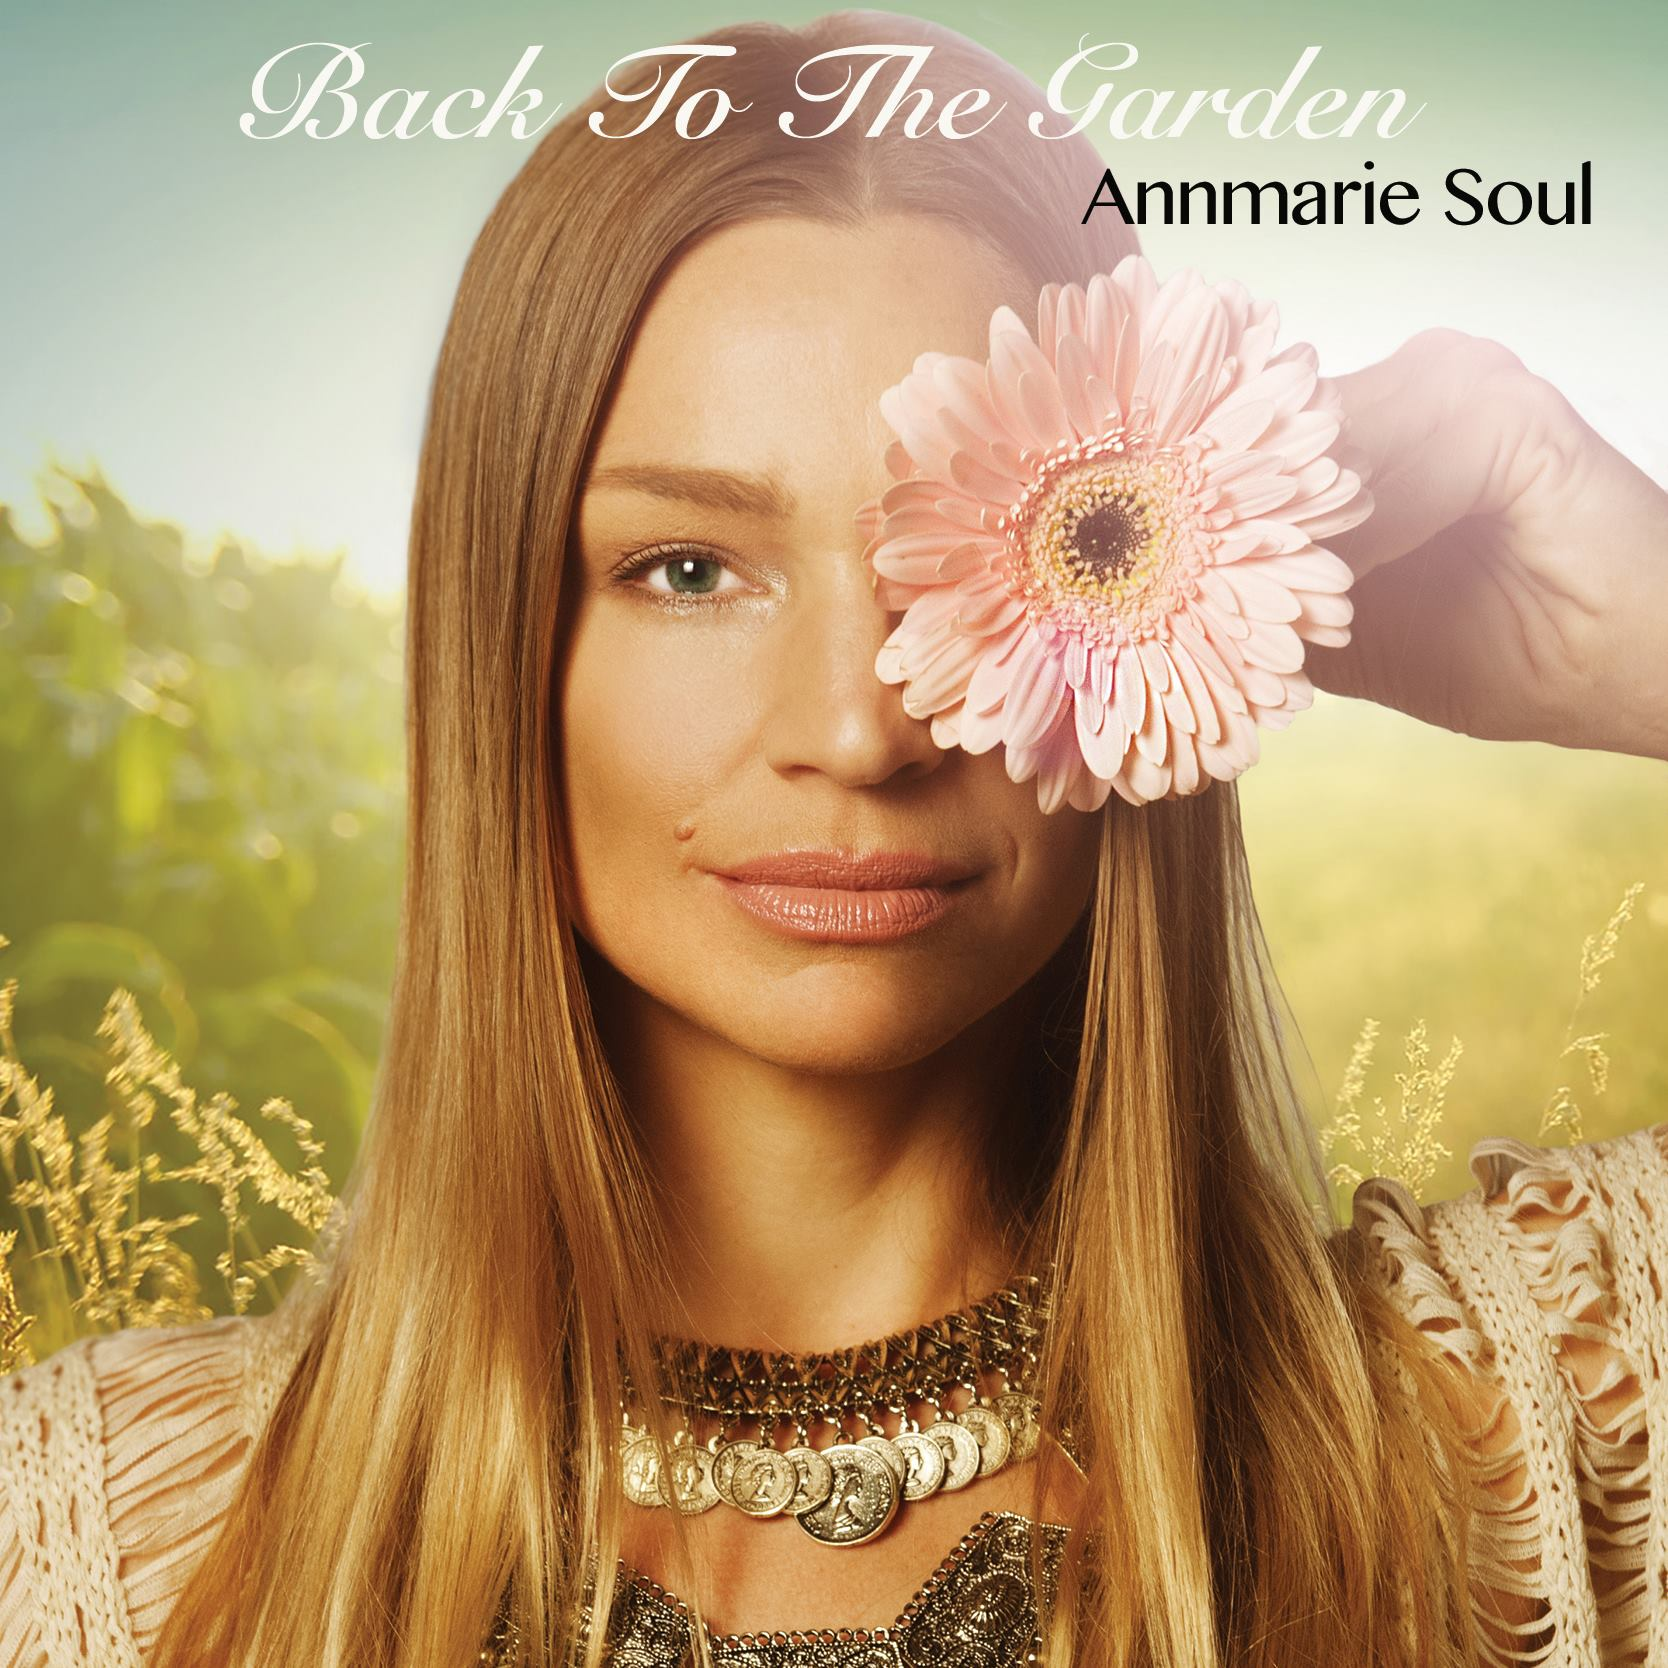 Annmarie Solo